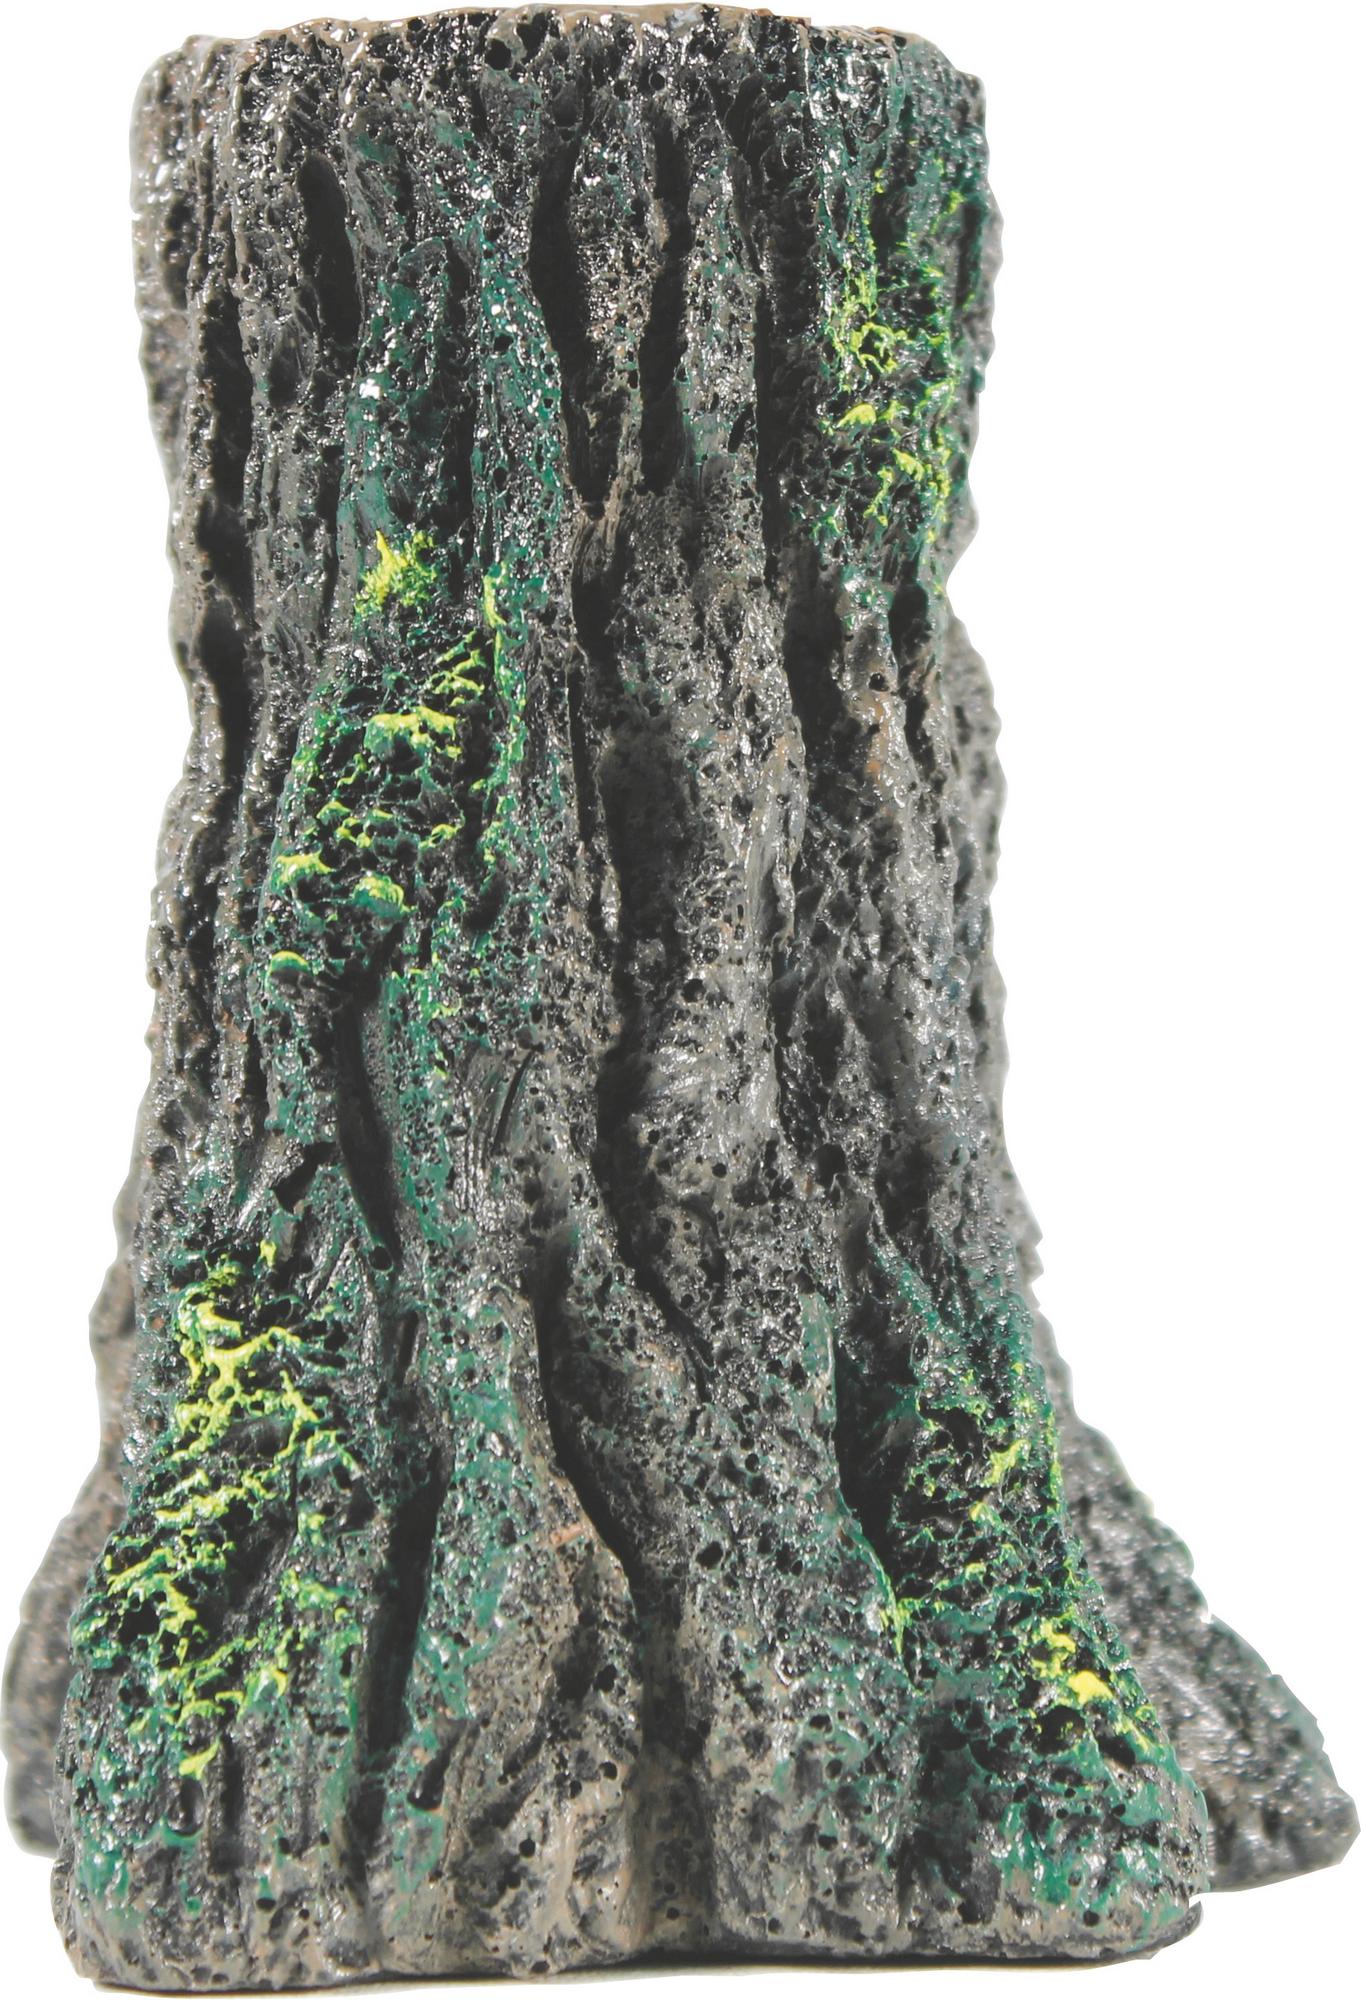 Glofish Tree Stump Aquarium Ornament